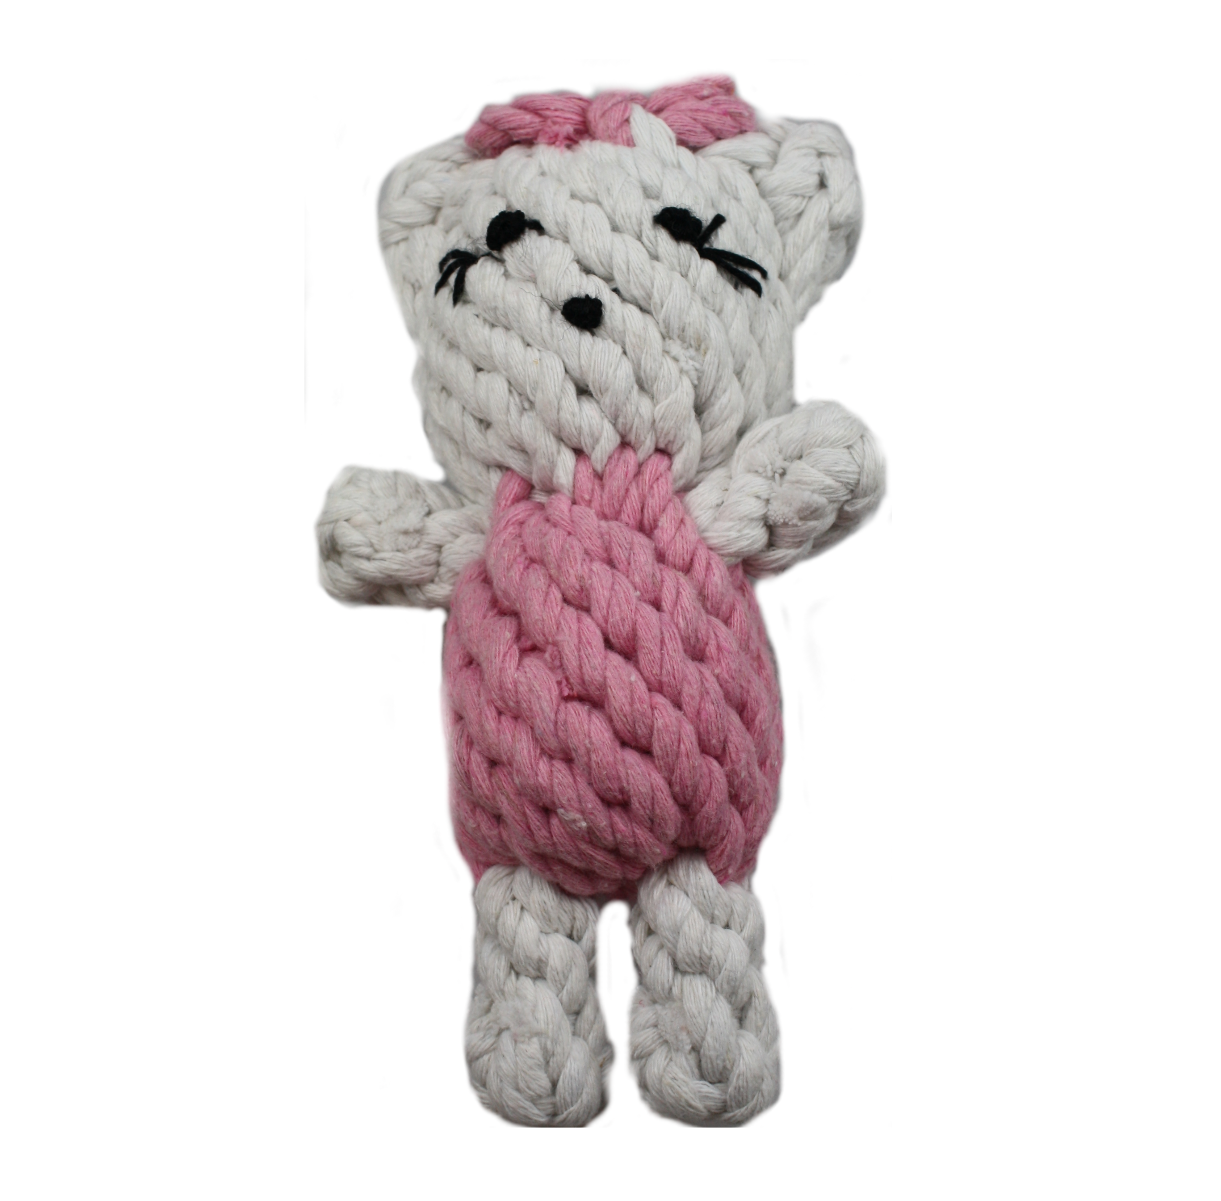 Spielzeug für Hunde Bär Lady